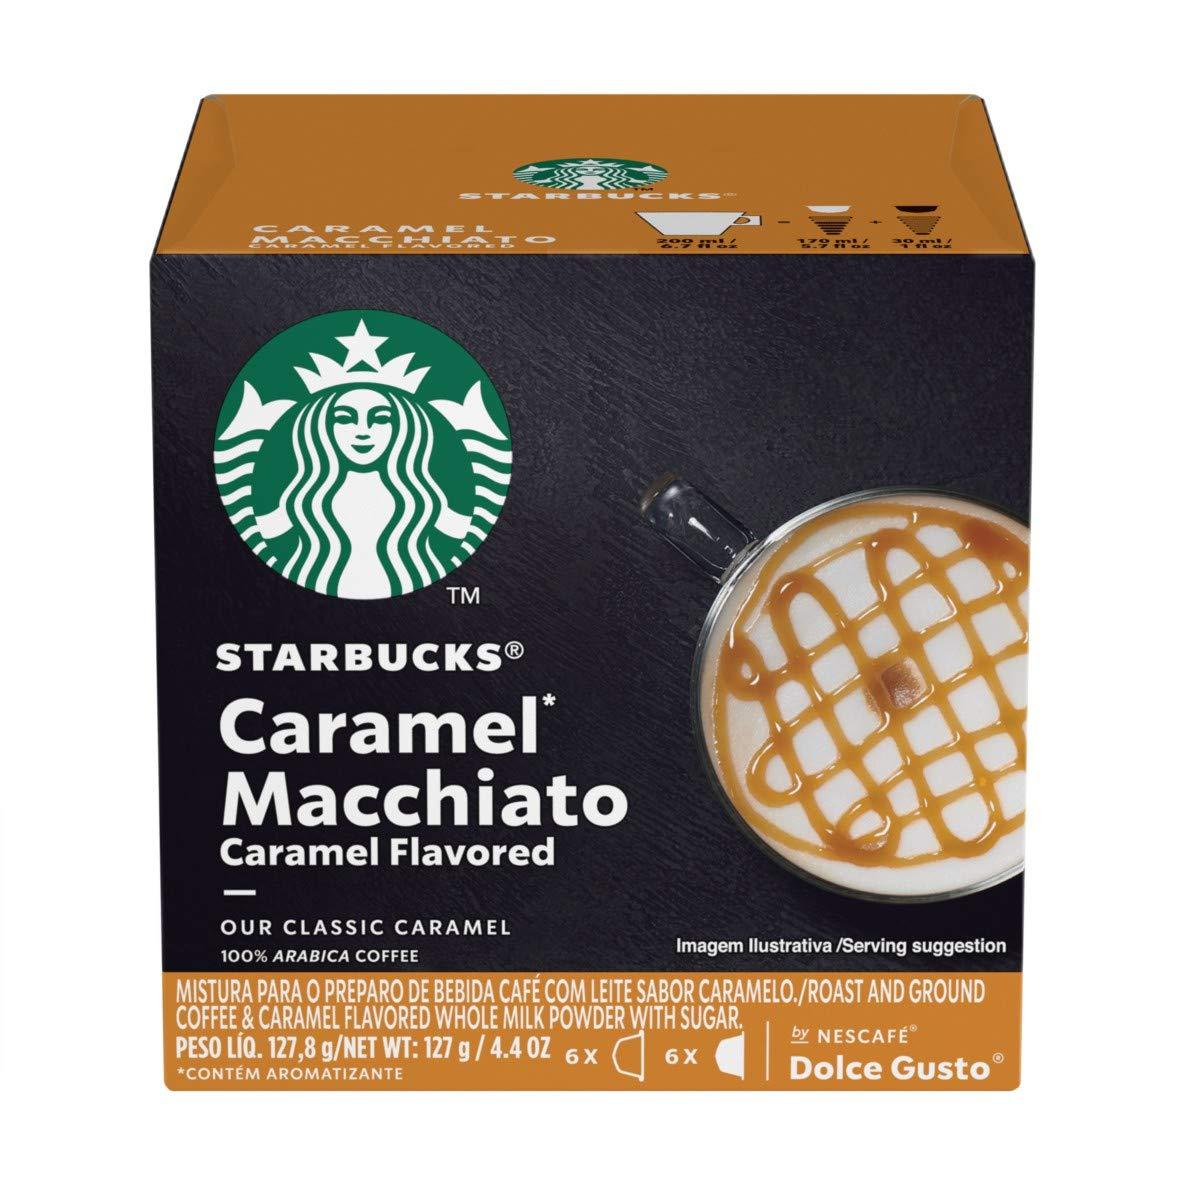 Starbucks Coffee by Nescafe Dolce Gusto, Starbucks Caramel Macchiato, 36 Capsules, Makes 18 Servings